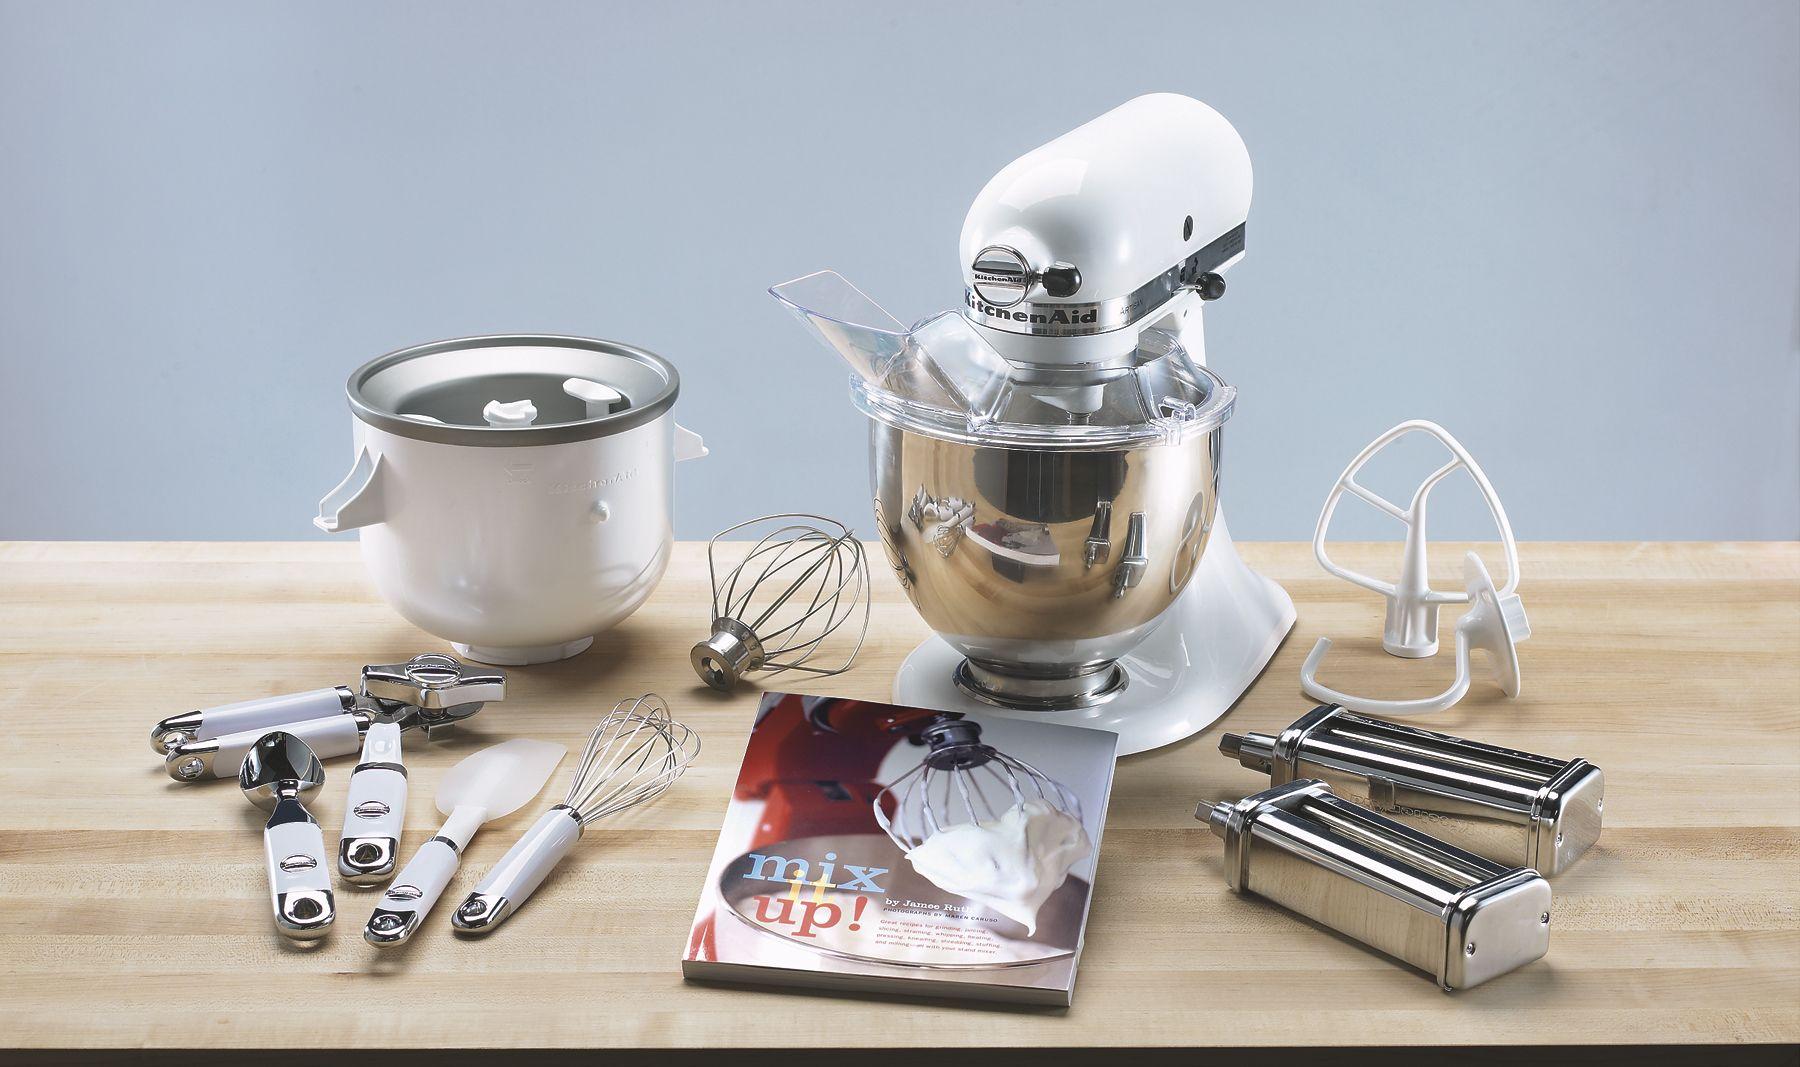 kitchen aid mixer accessories wood mode cabinets kitchenaid 2 quart ice cream maker attachment appliances